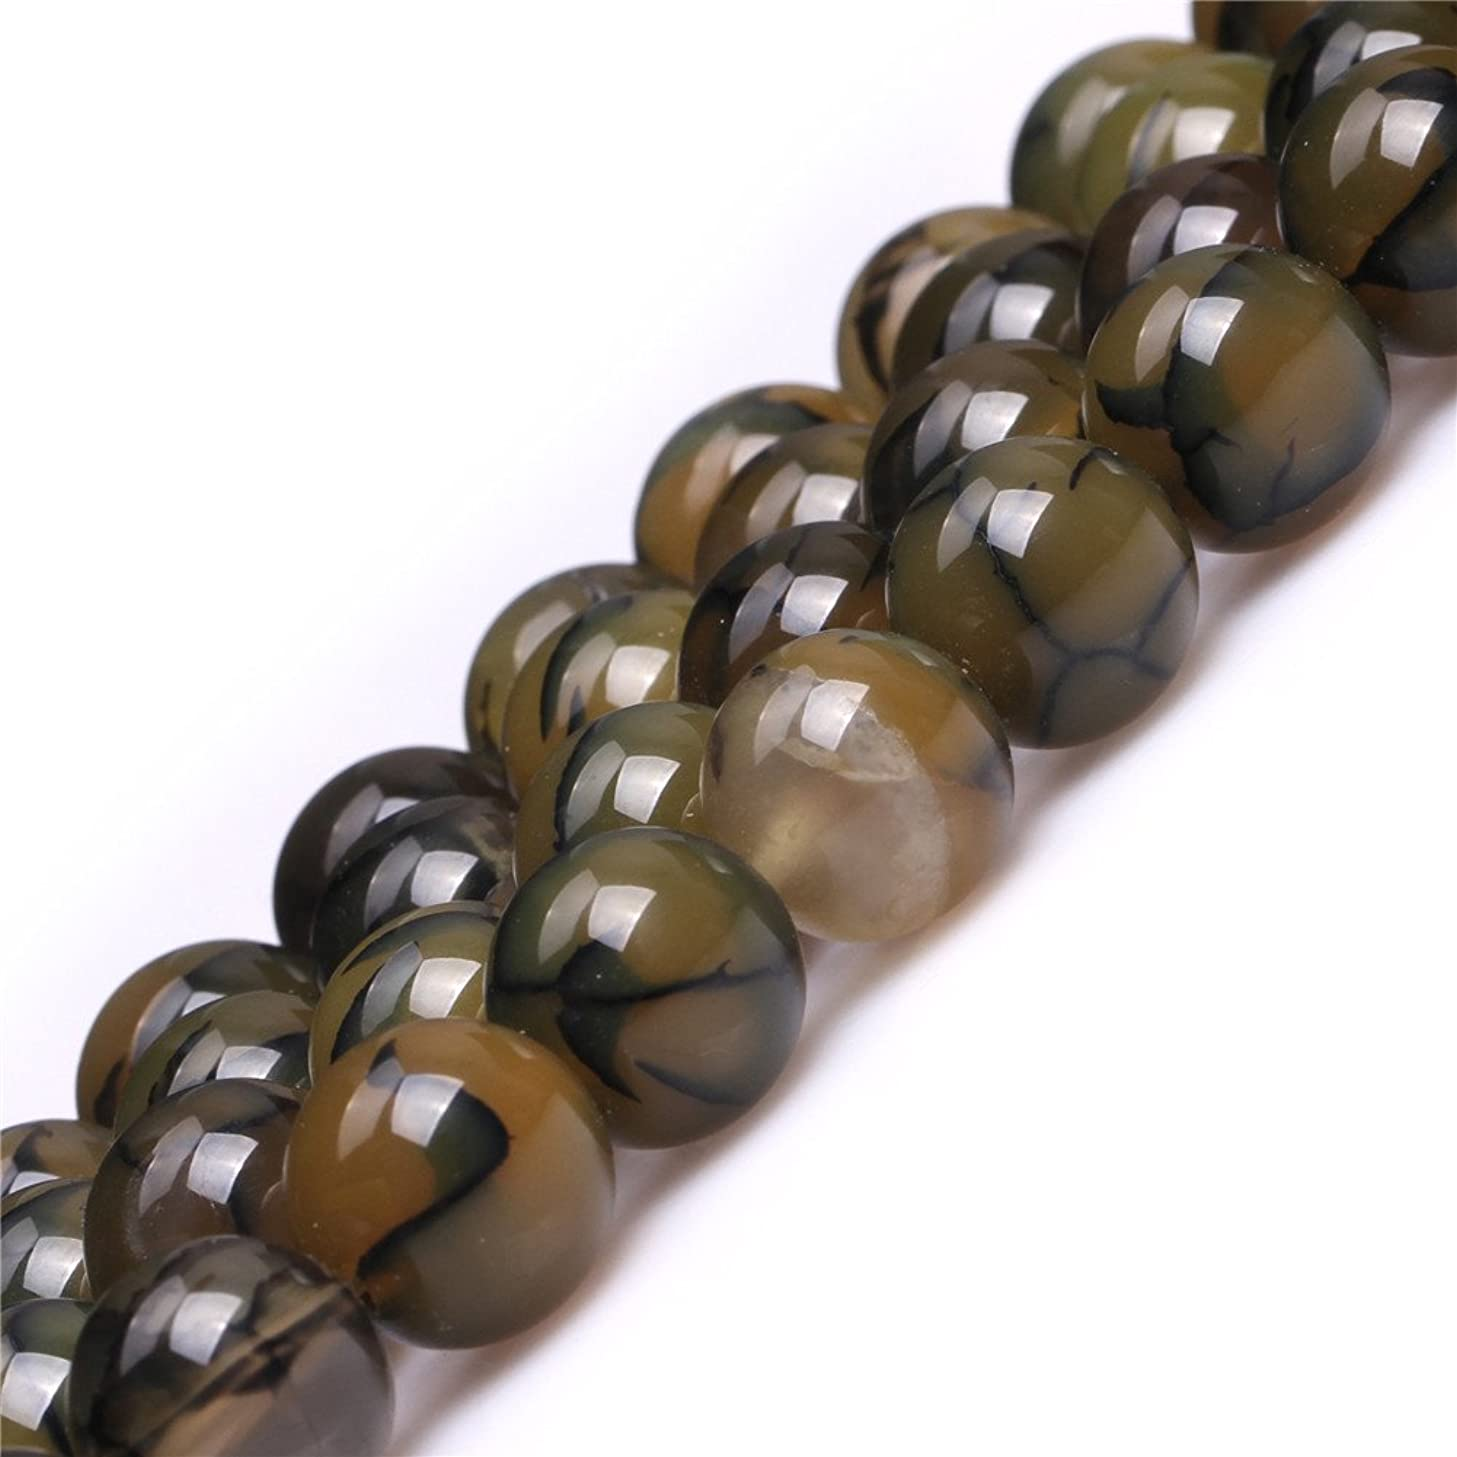 JOE FOREMAN 12mm Crackle Agate Semi Precious Gemstone Round Loose Beads for Jewelry Making Yellow Green DIY Handmade Craft Supplies 15